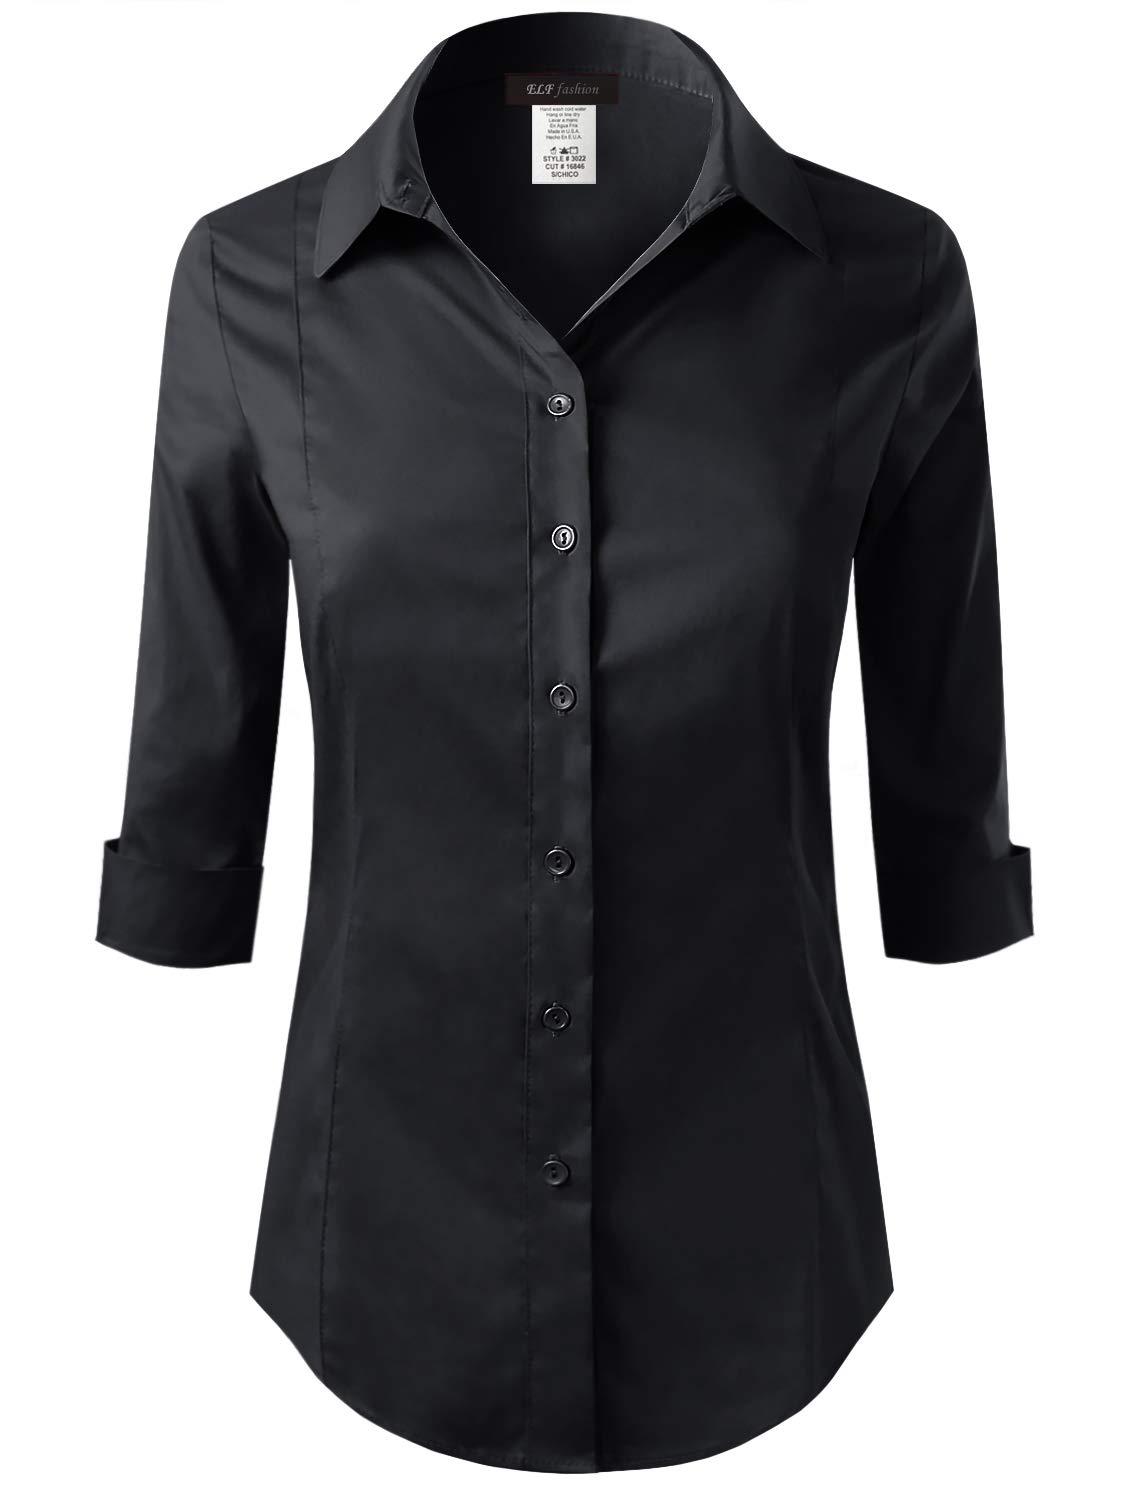 ELF FASHION 七分袖纽扣衬衫女式美国制造(尺码 S~3XL)